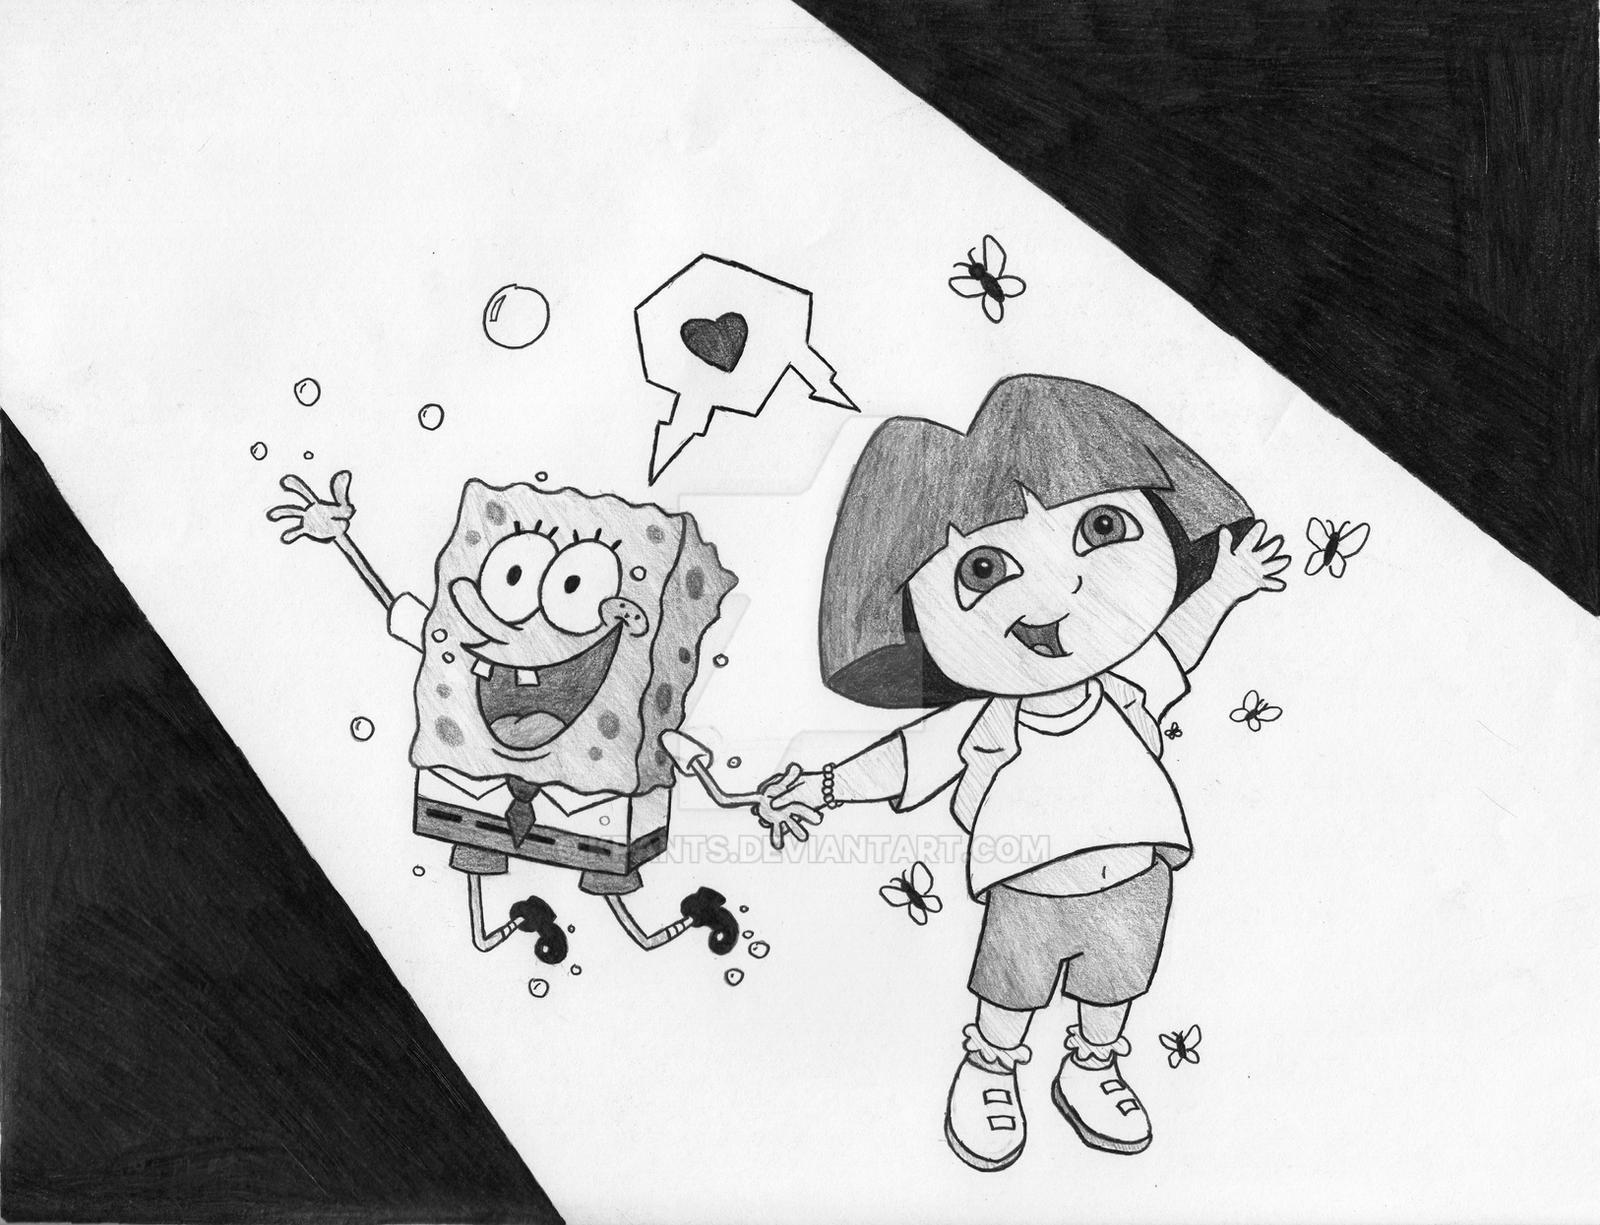 Spongebob Squarepants And Dora The Explorer By KPants On